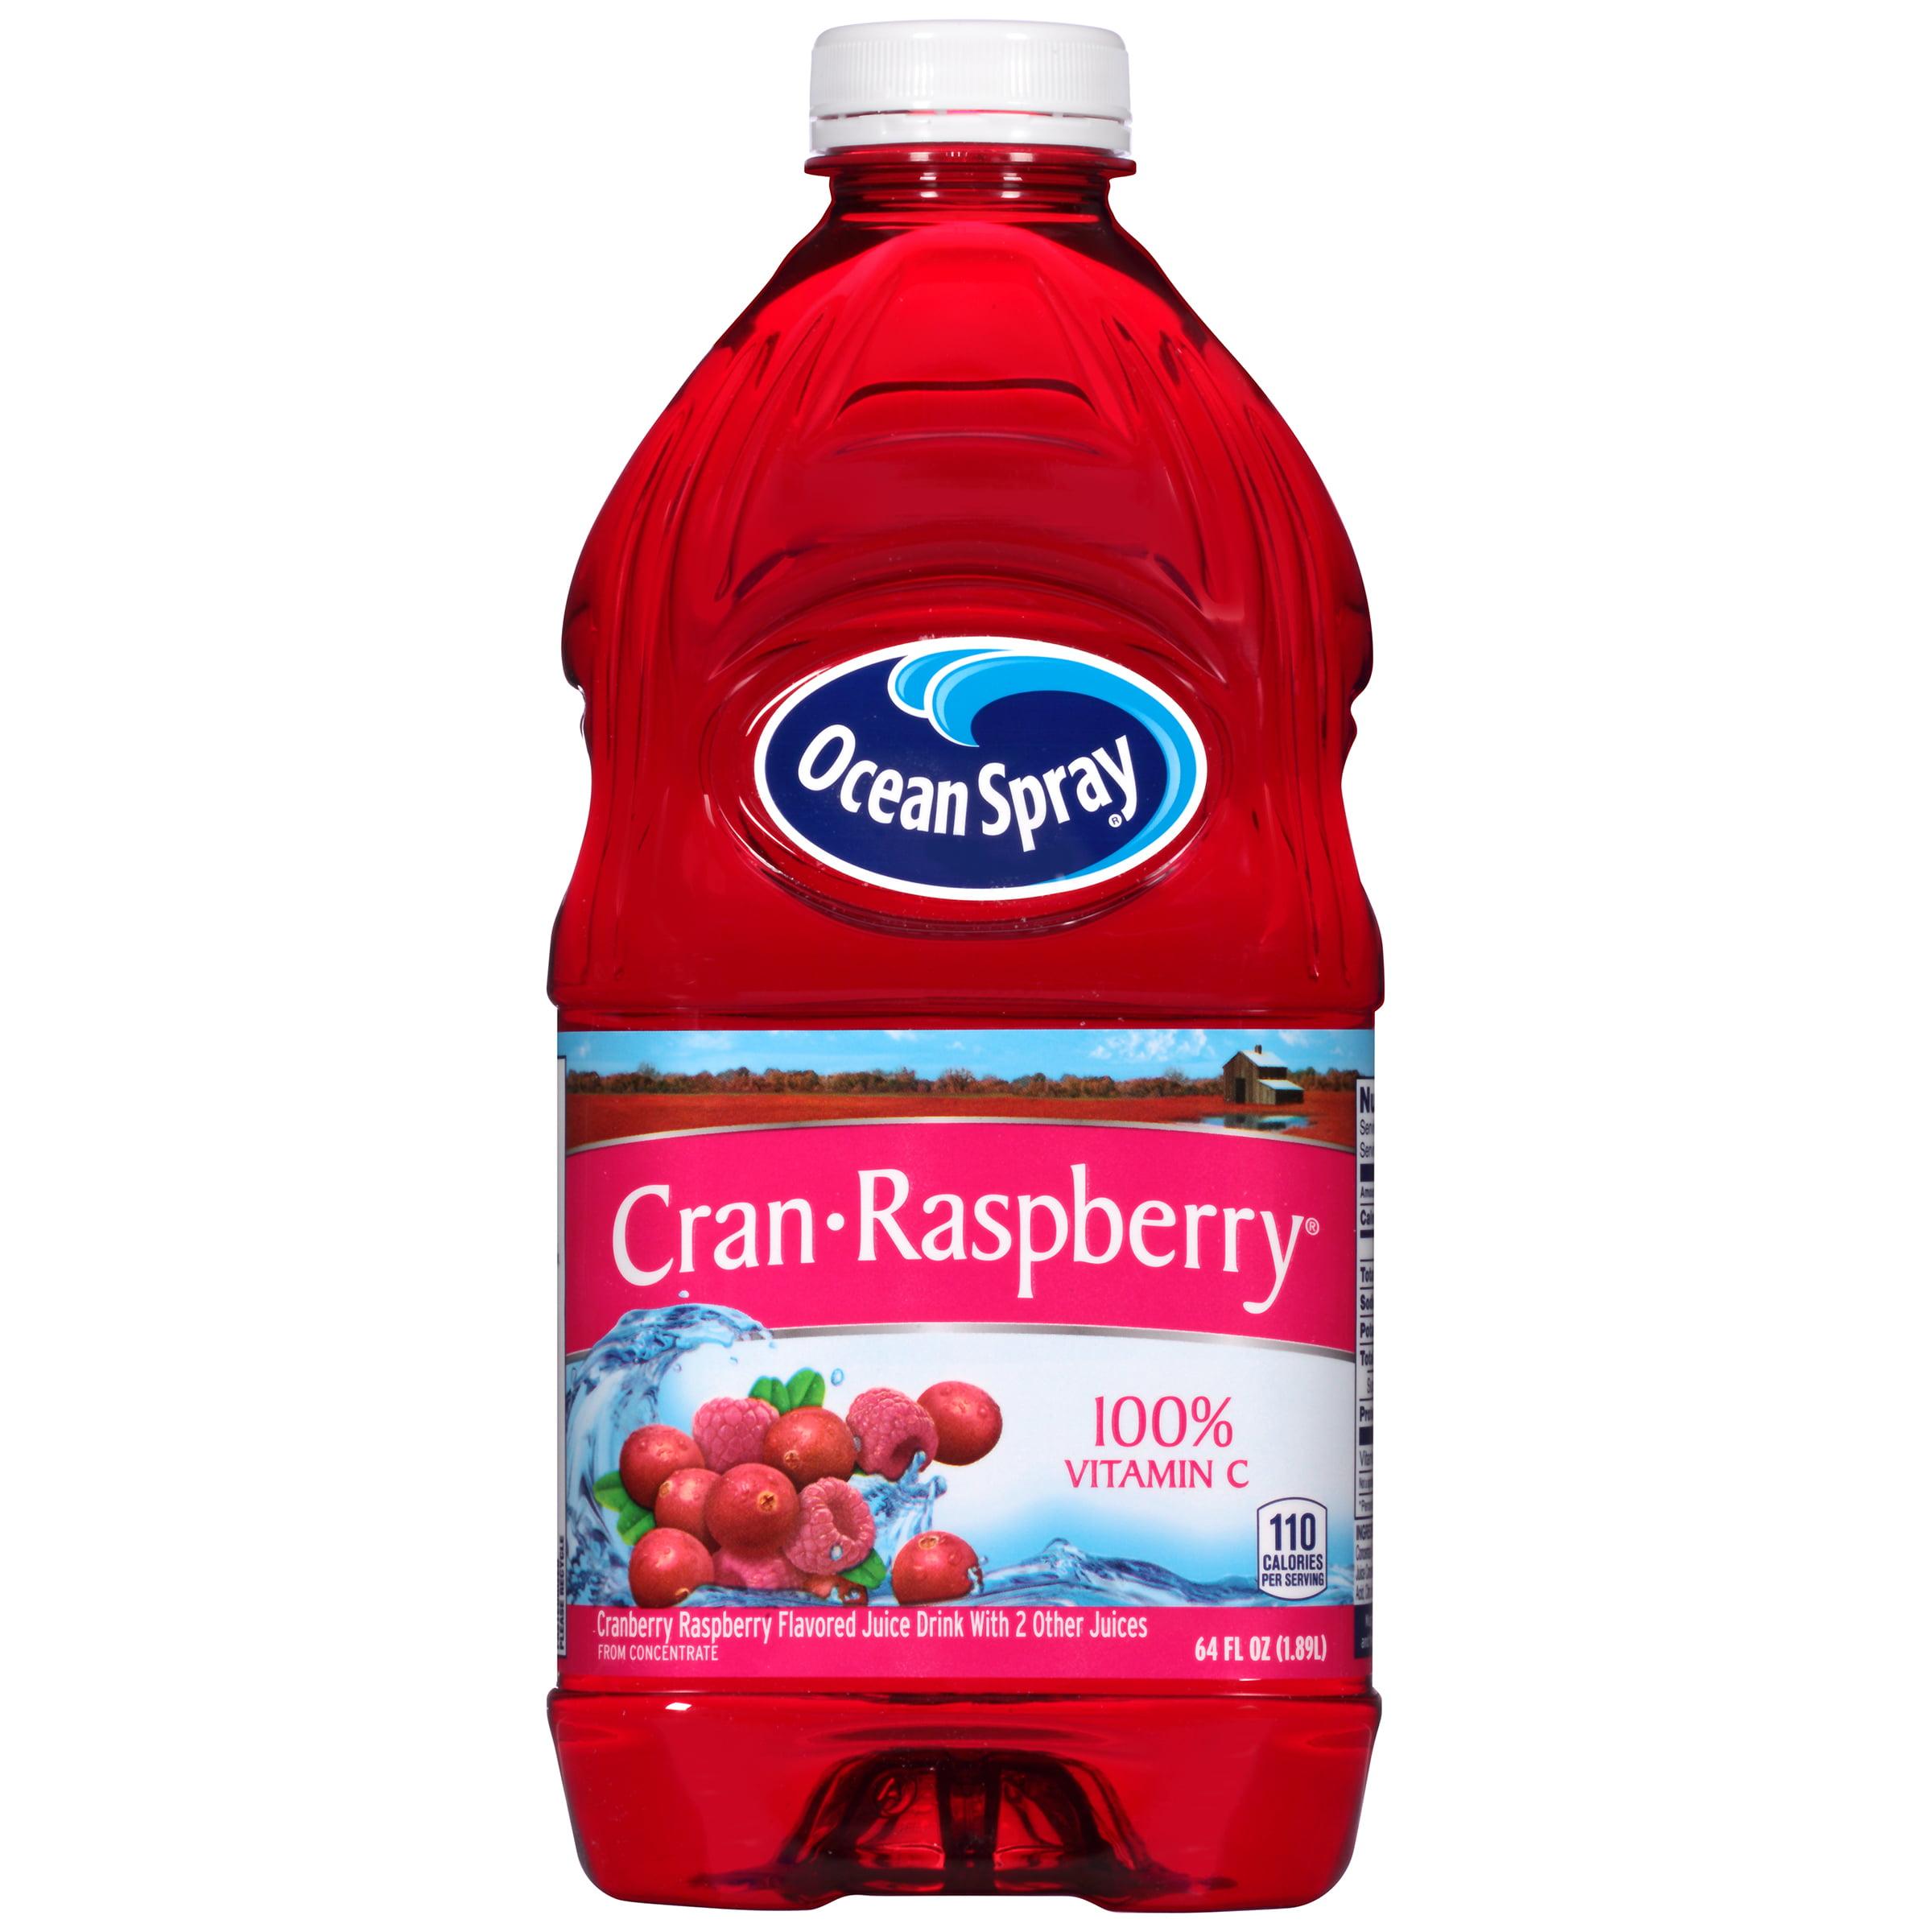 Ocean Spray Fruit Juice, Cran-Raspberry, 64 Fl Oz, 1 Count